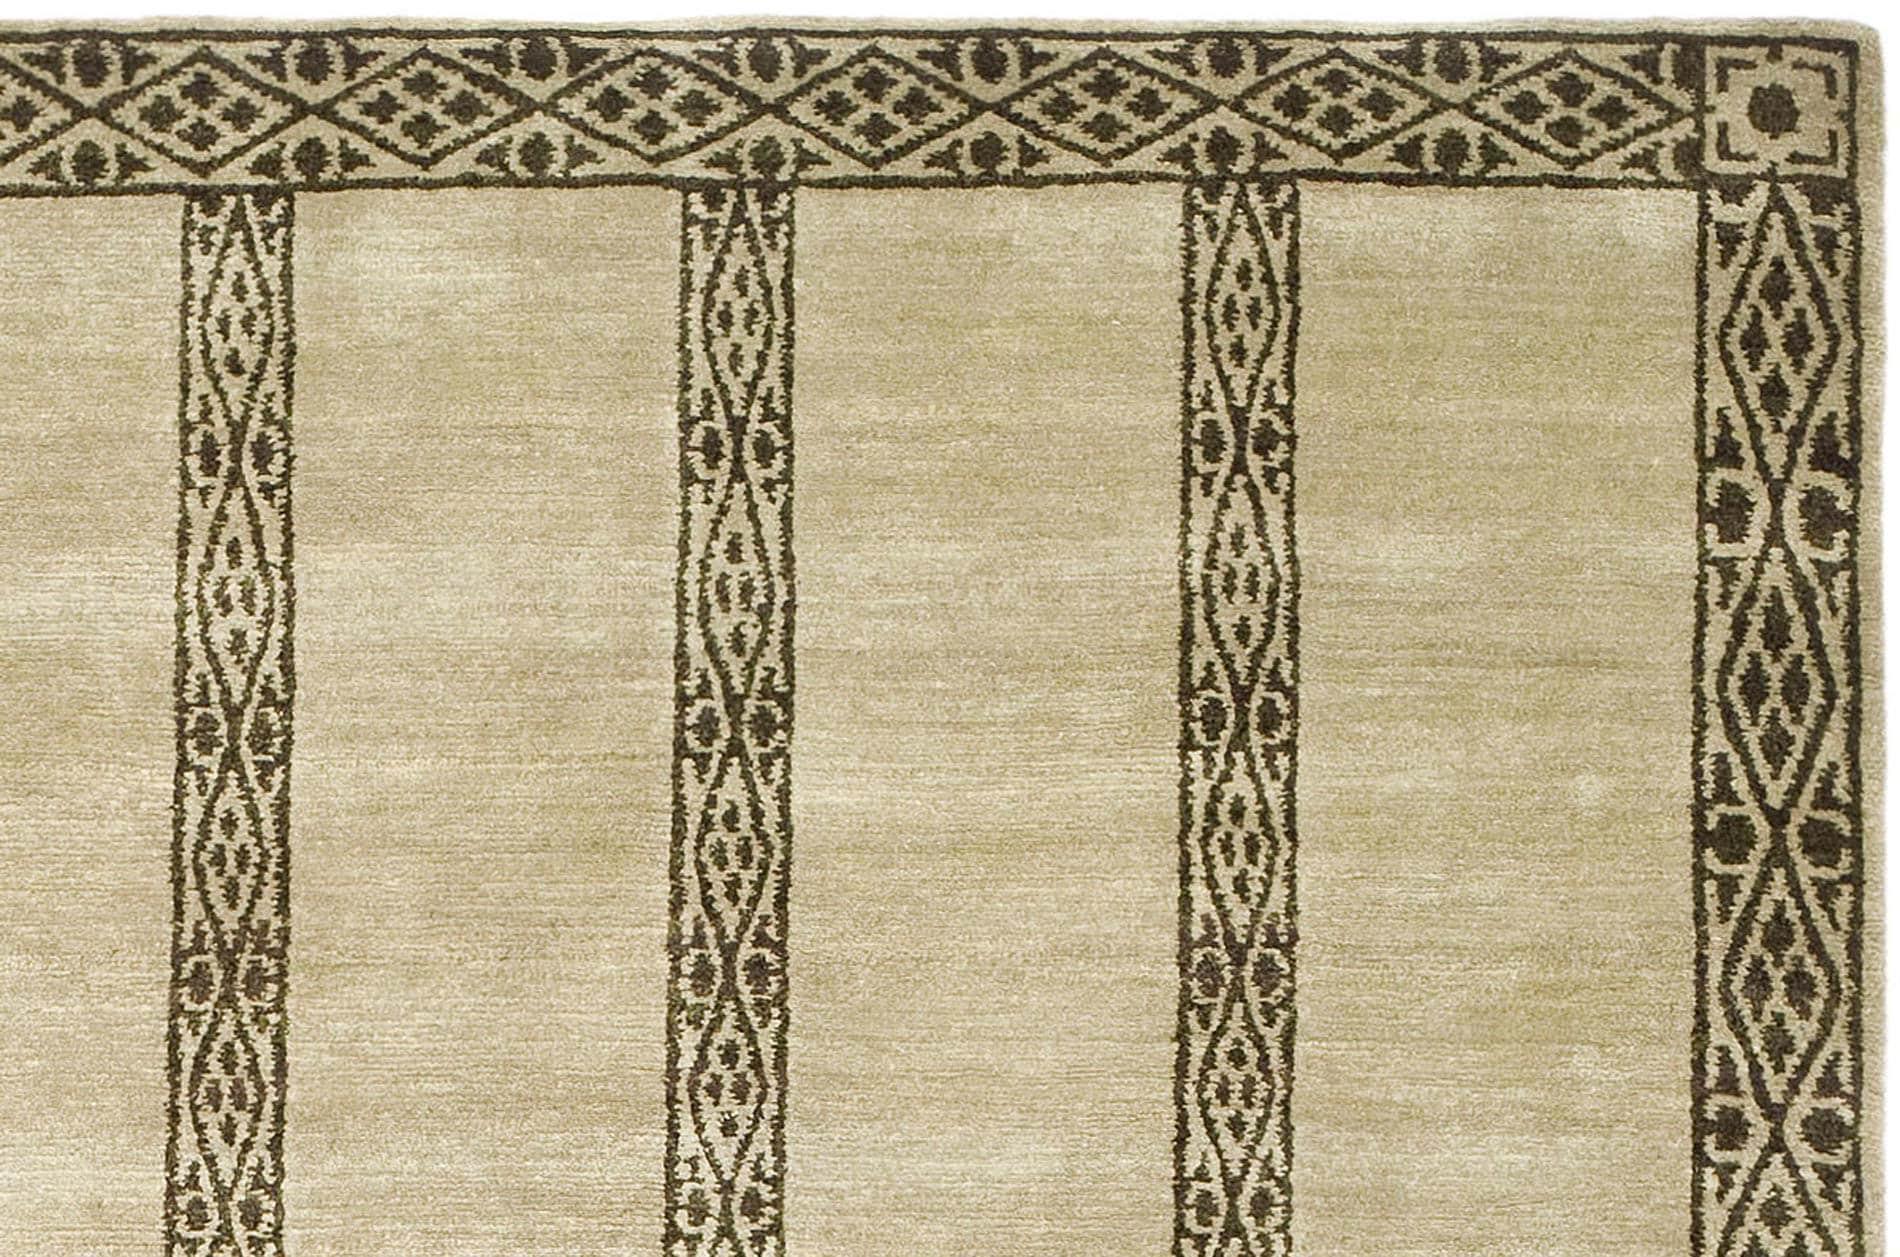 Handmade Thomas O'Brien Marco Olive/ Green Wool Rug (9' x 12') - Thumbnail 2